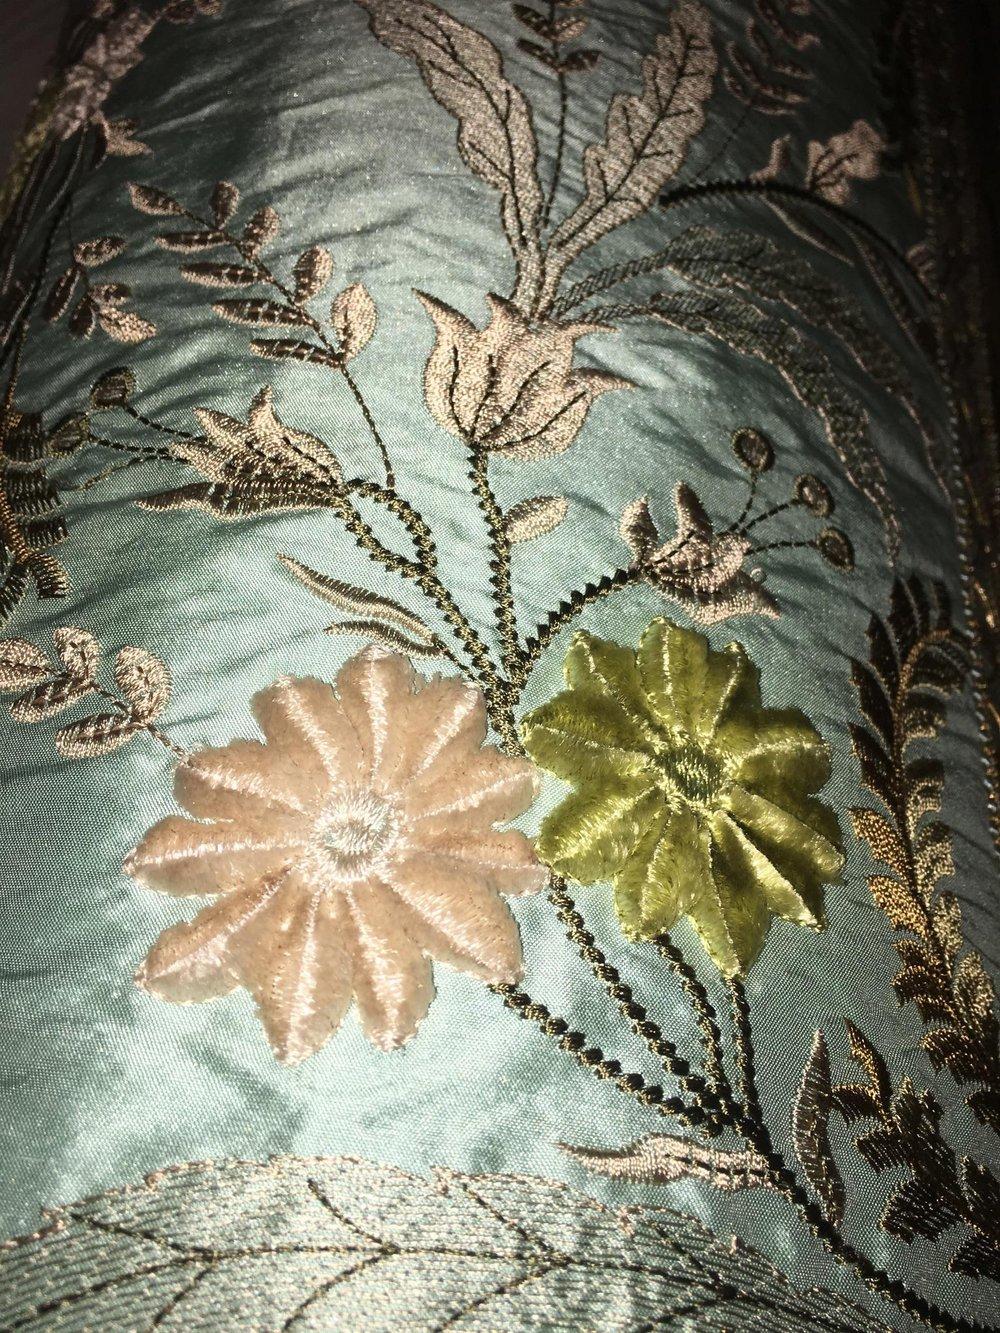 French Vervain Bolster Designer Pillow With 90/10 Down Insert